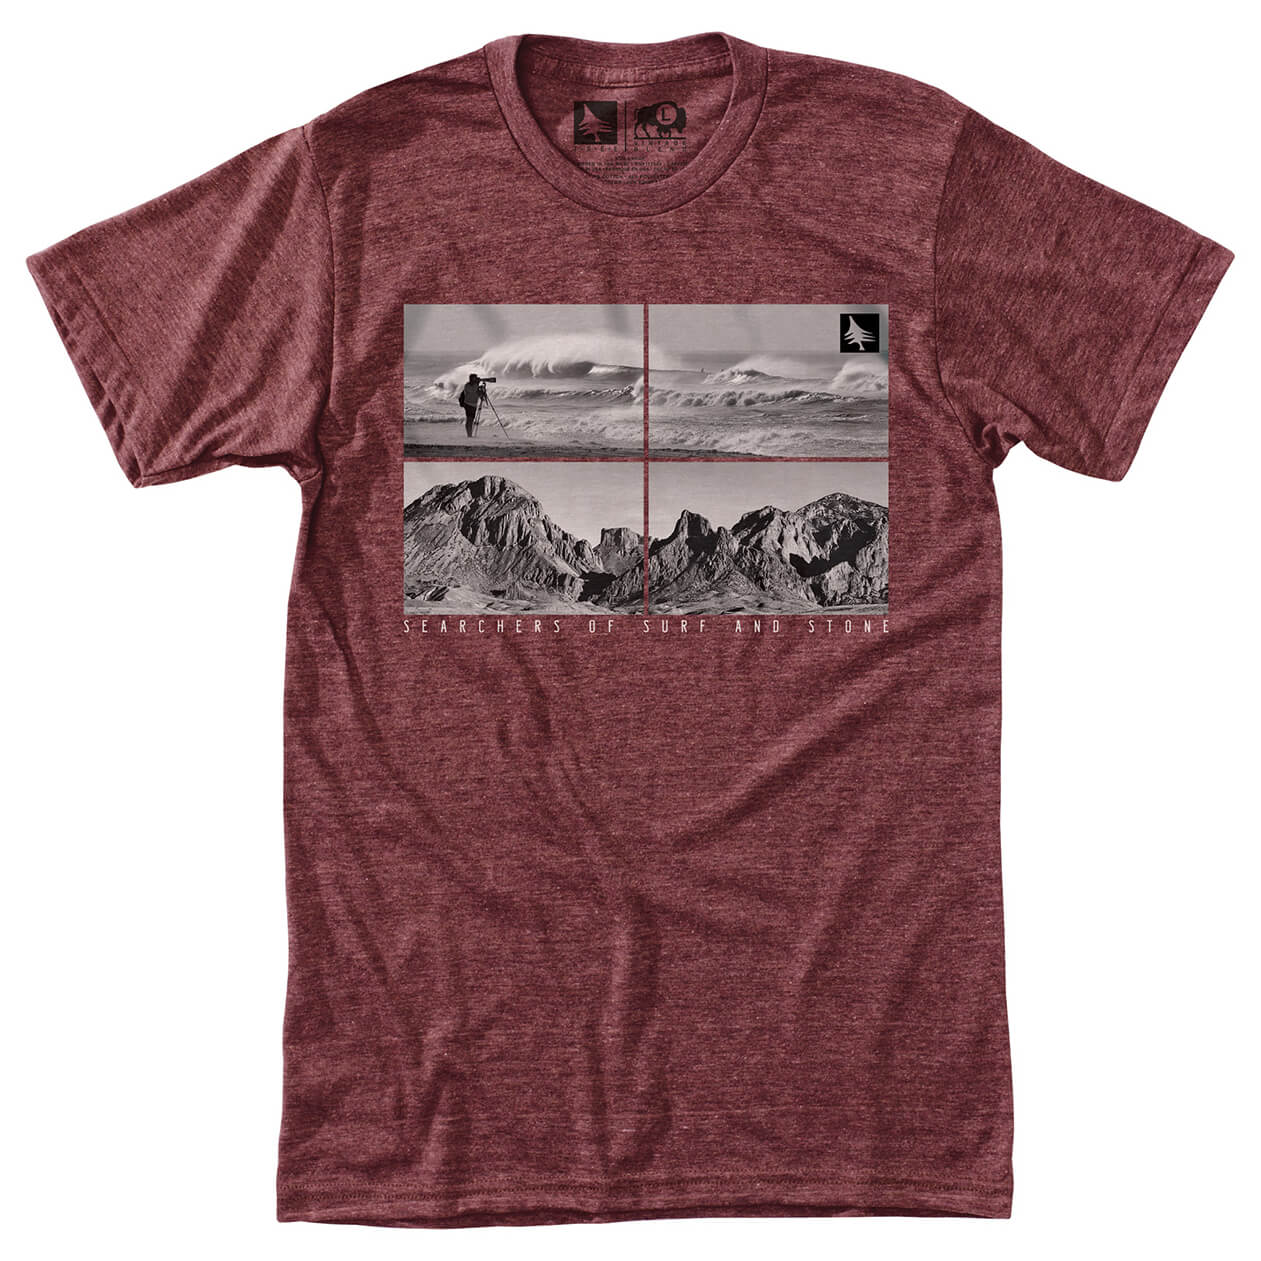 Hippy tree quadrant tee t shirt homme achat en ligne for Hippie t shirts australia